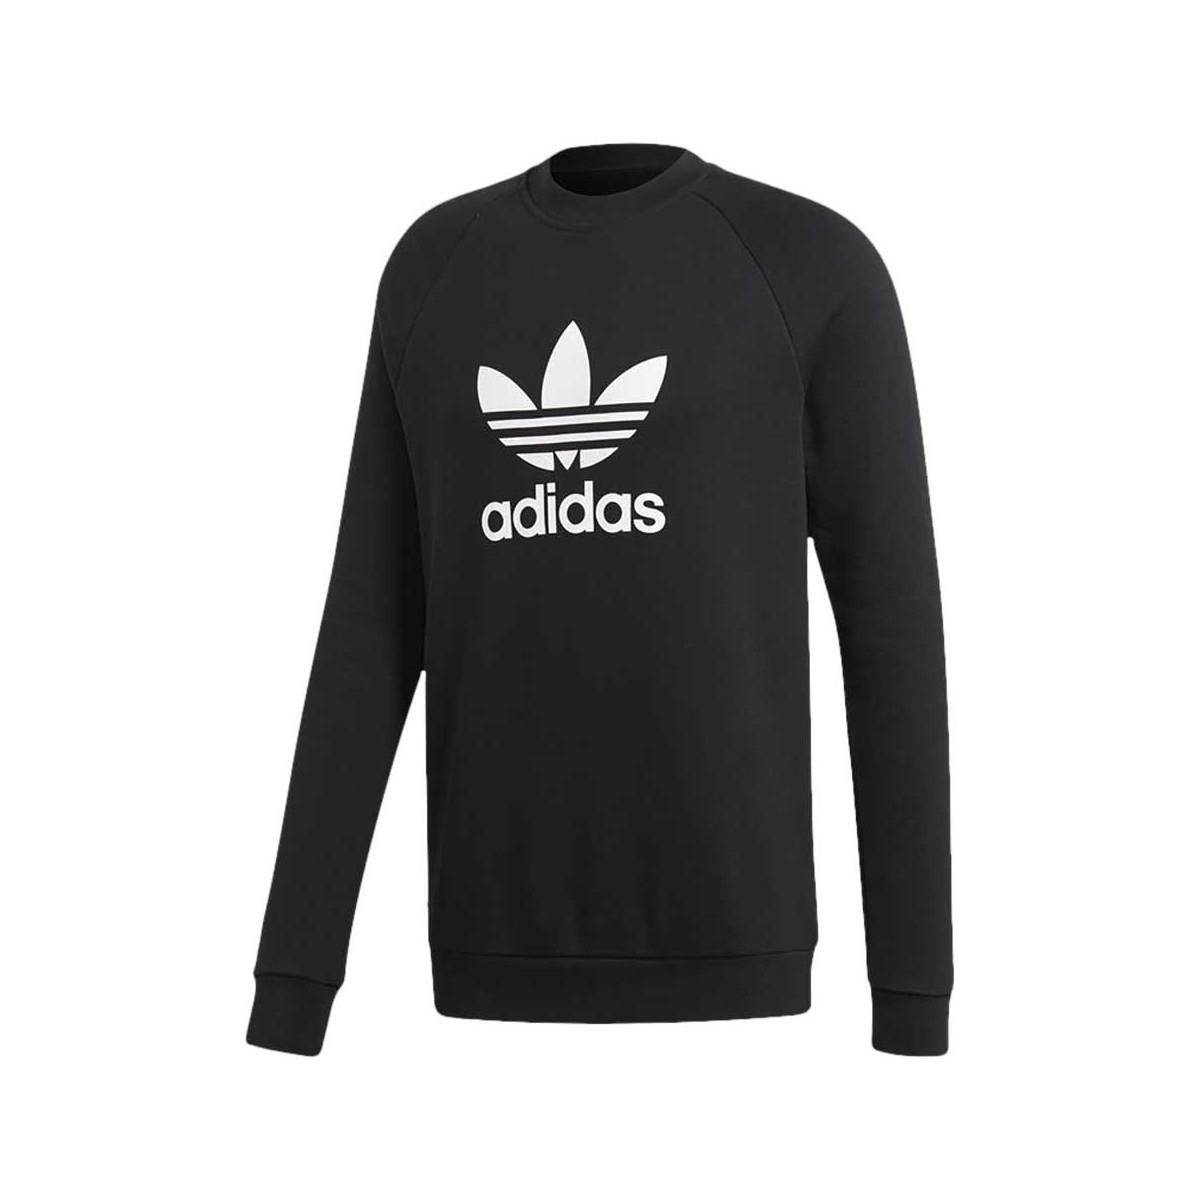 Adidas Felpa Trefoil Crew Black